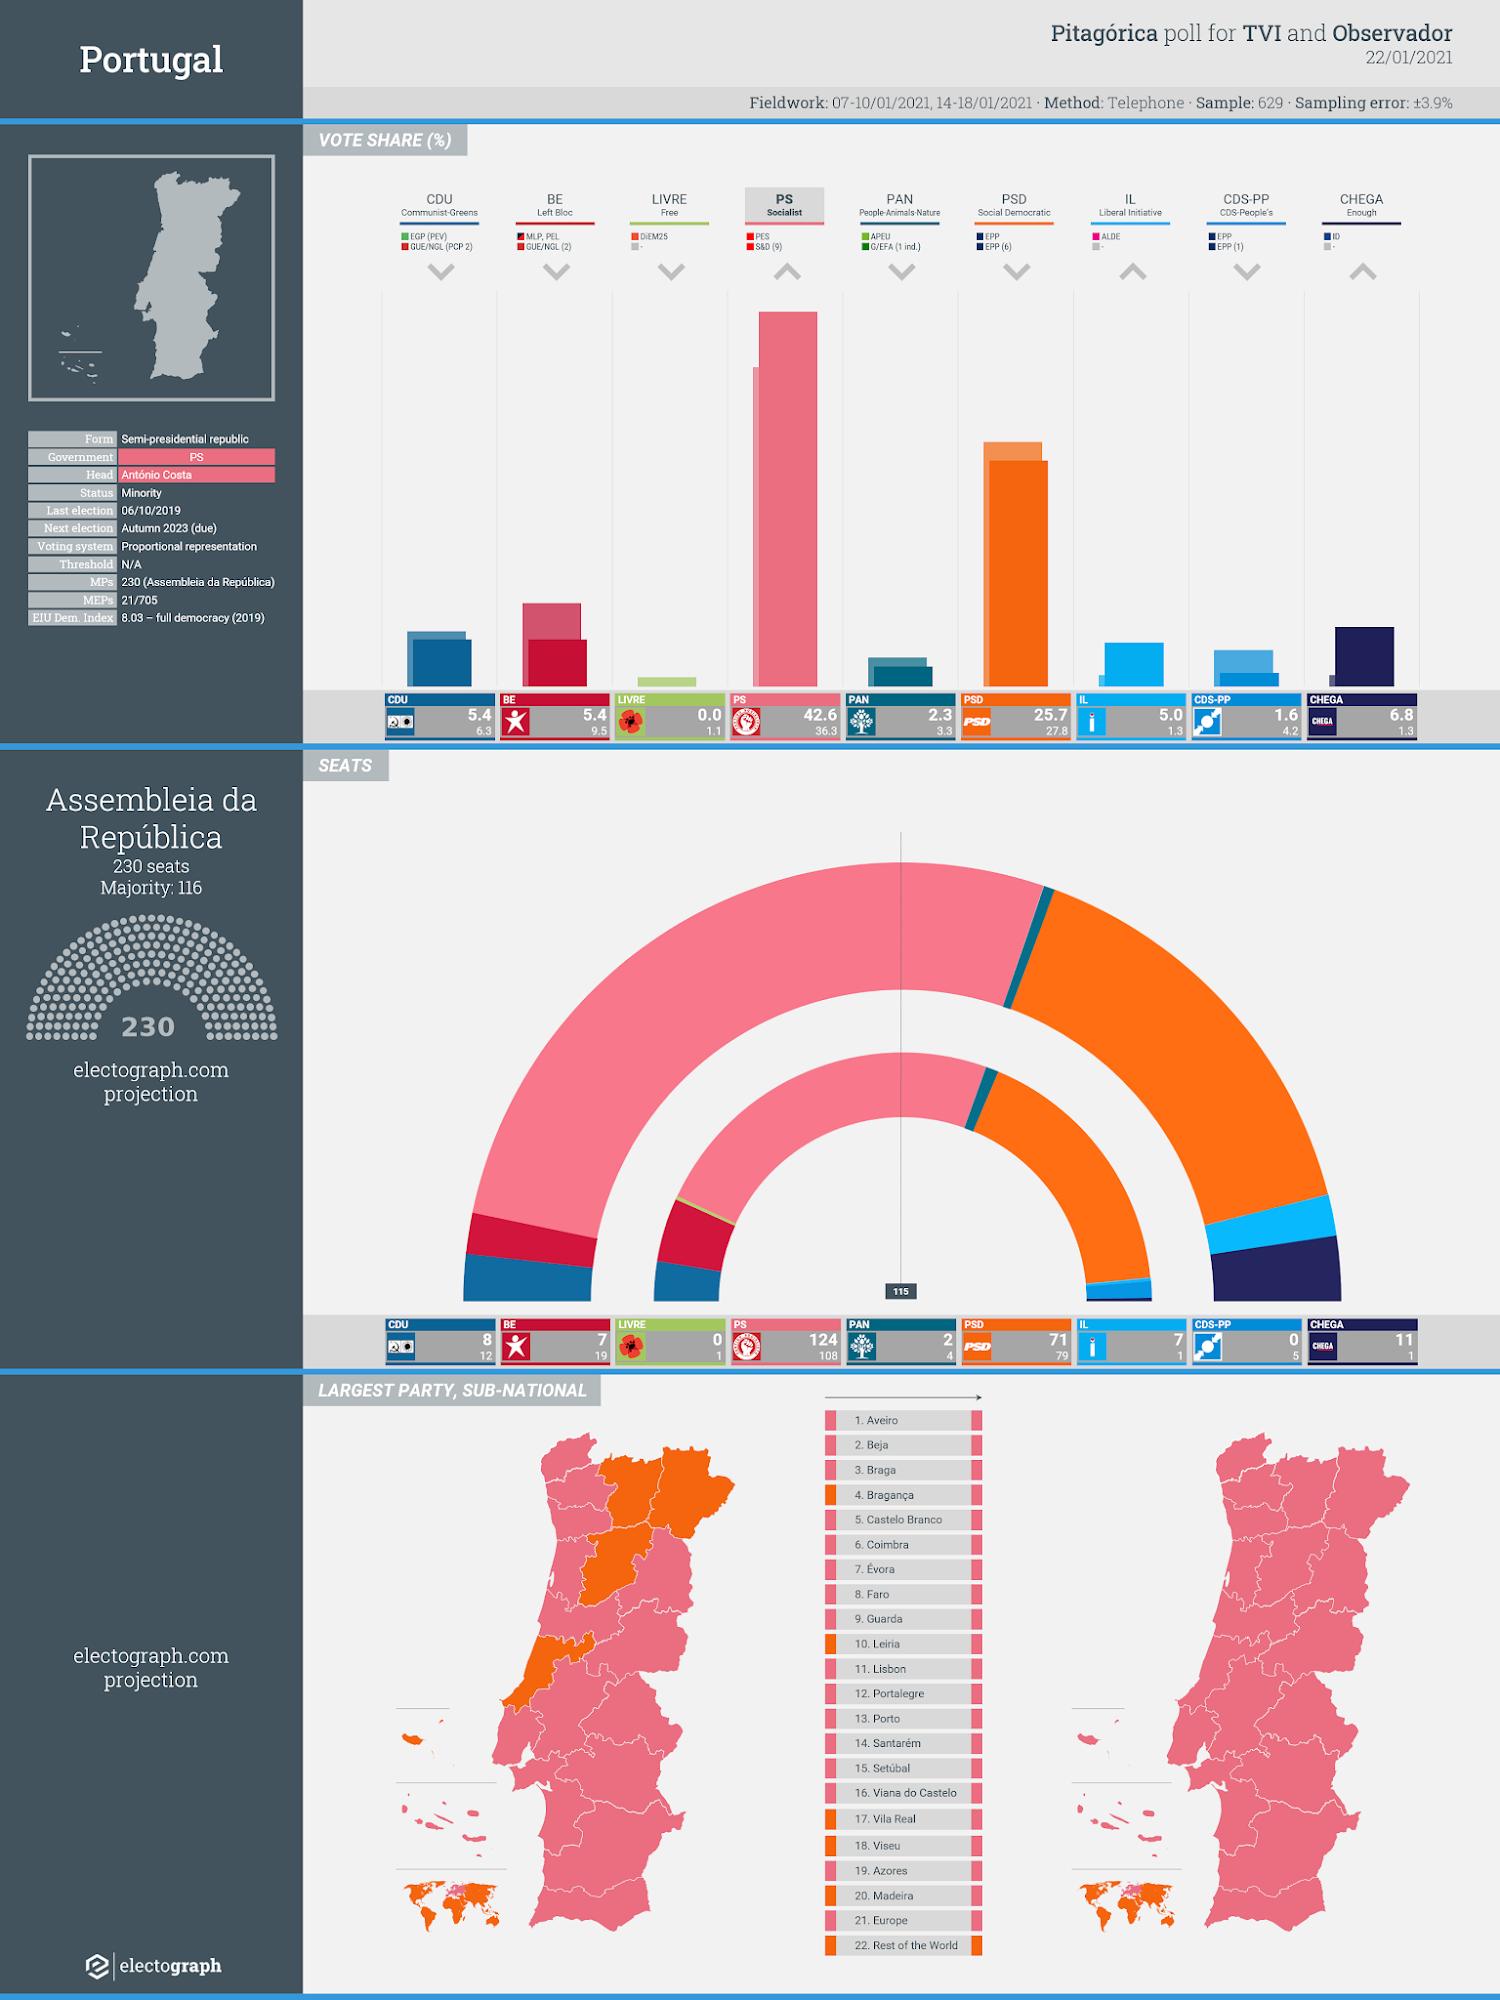 PORTUGAL: Pitagórica poll chart for TVI and Observador, 22 January 2021